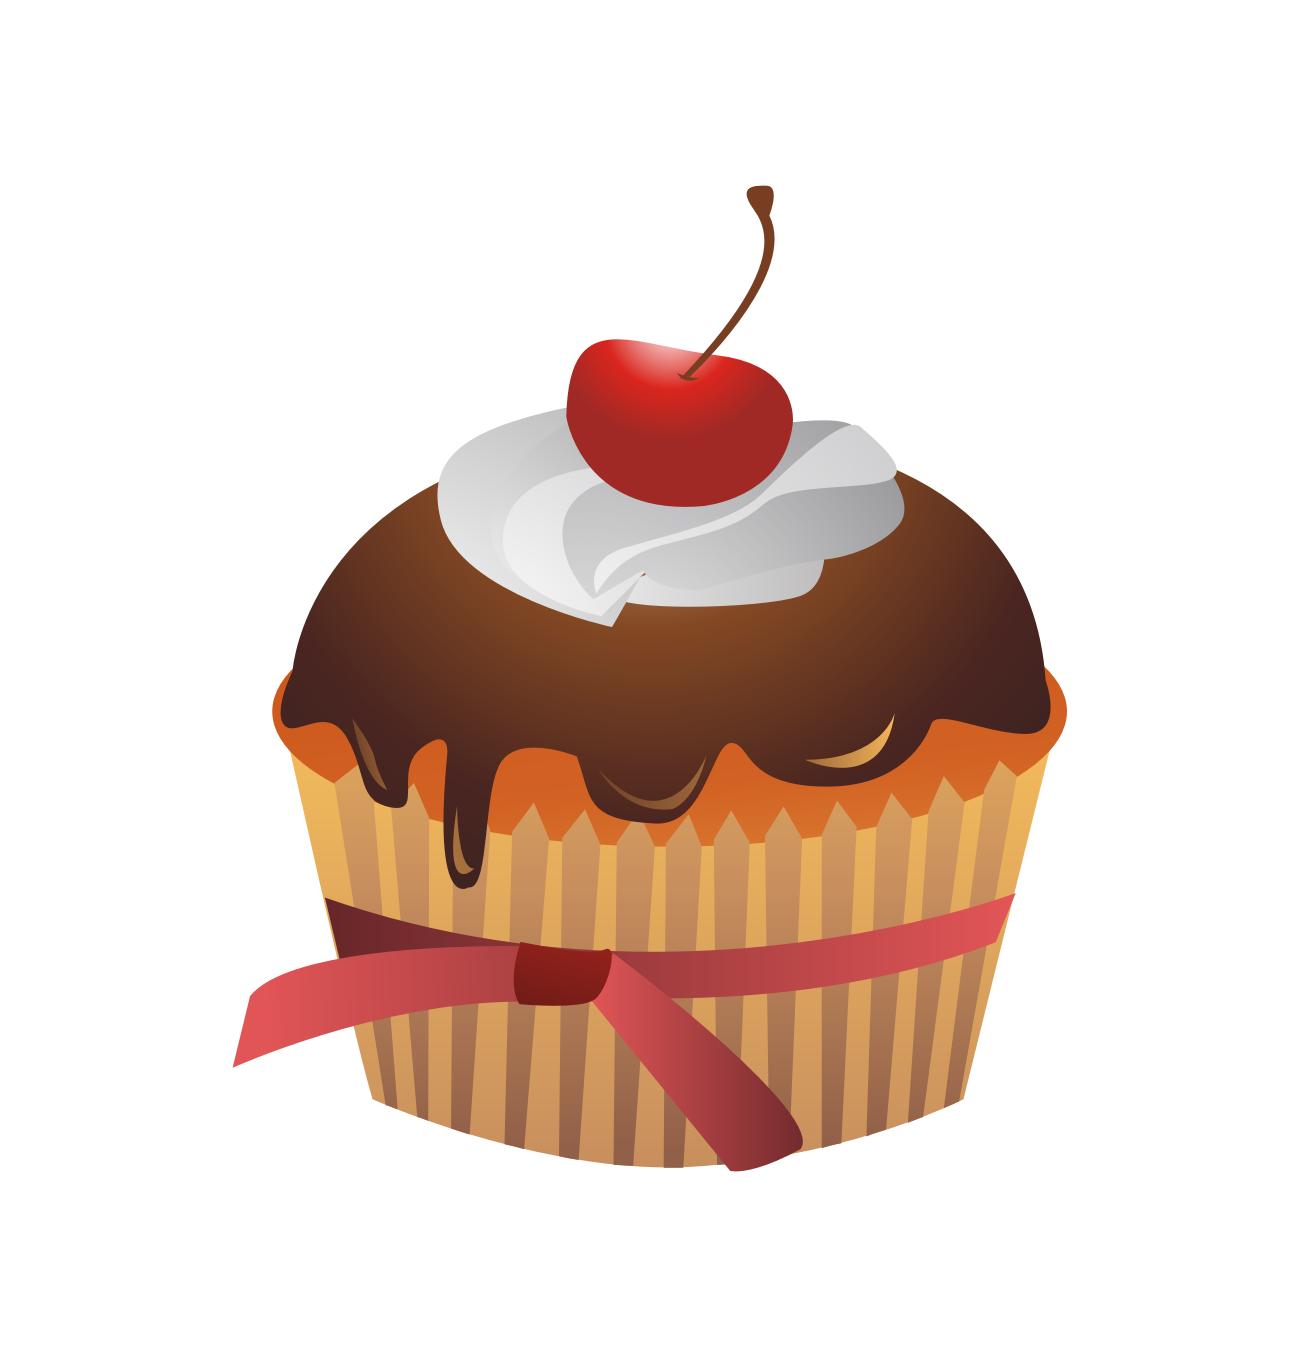 desserts clipart cherry cake